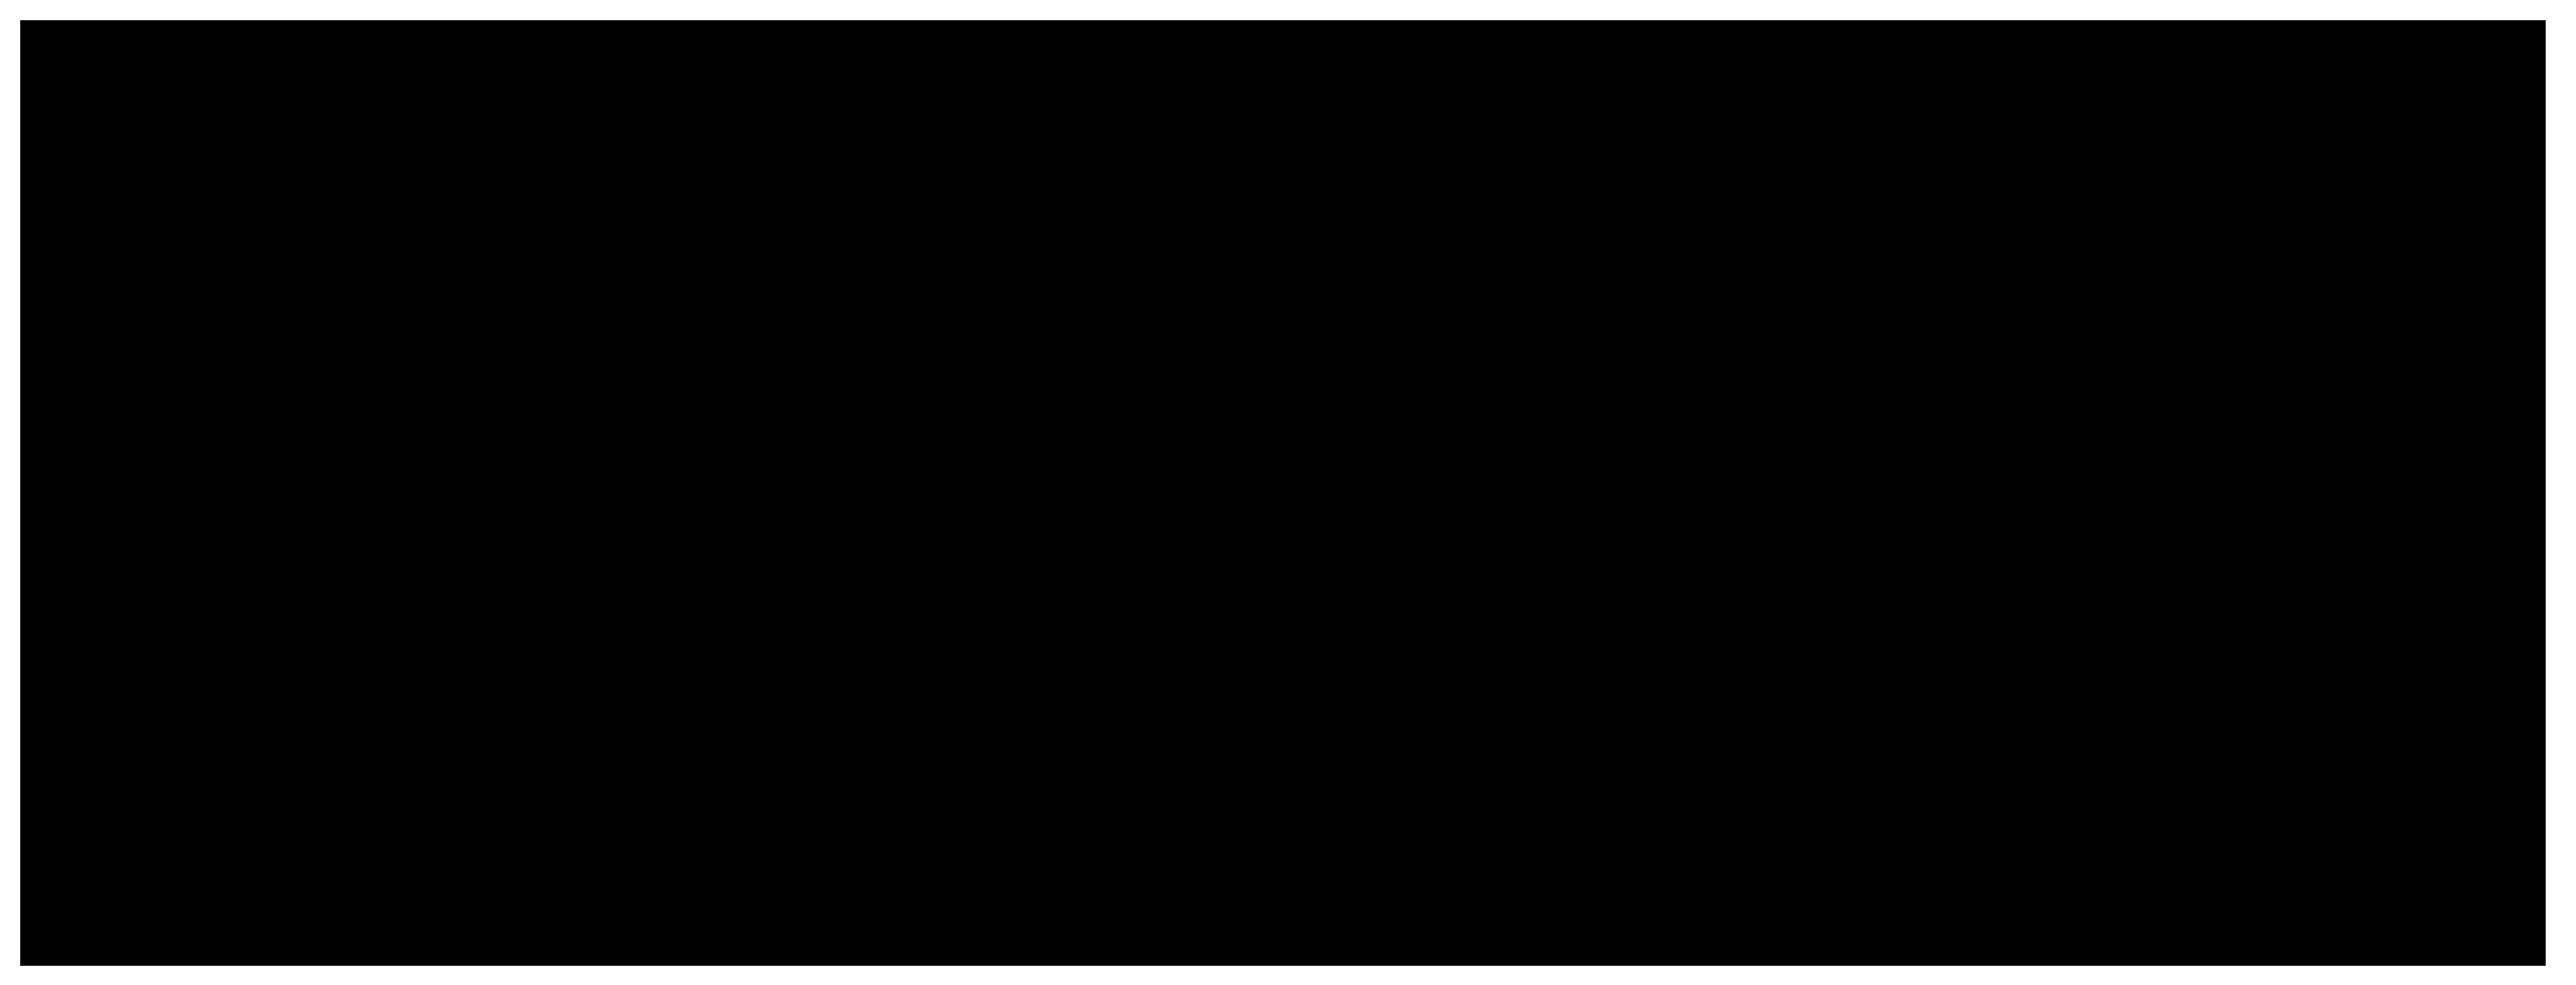 oakley logos download rh logos download com oakley logo png oakley logo png